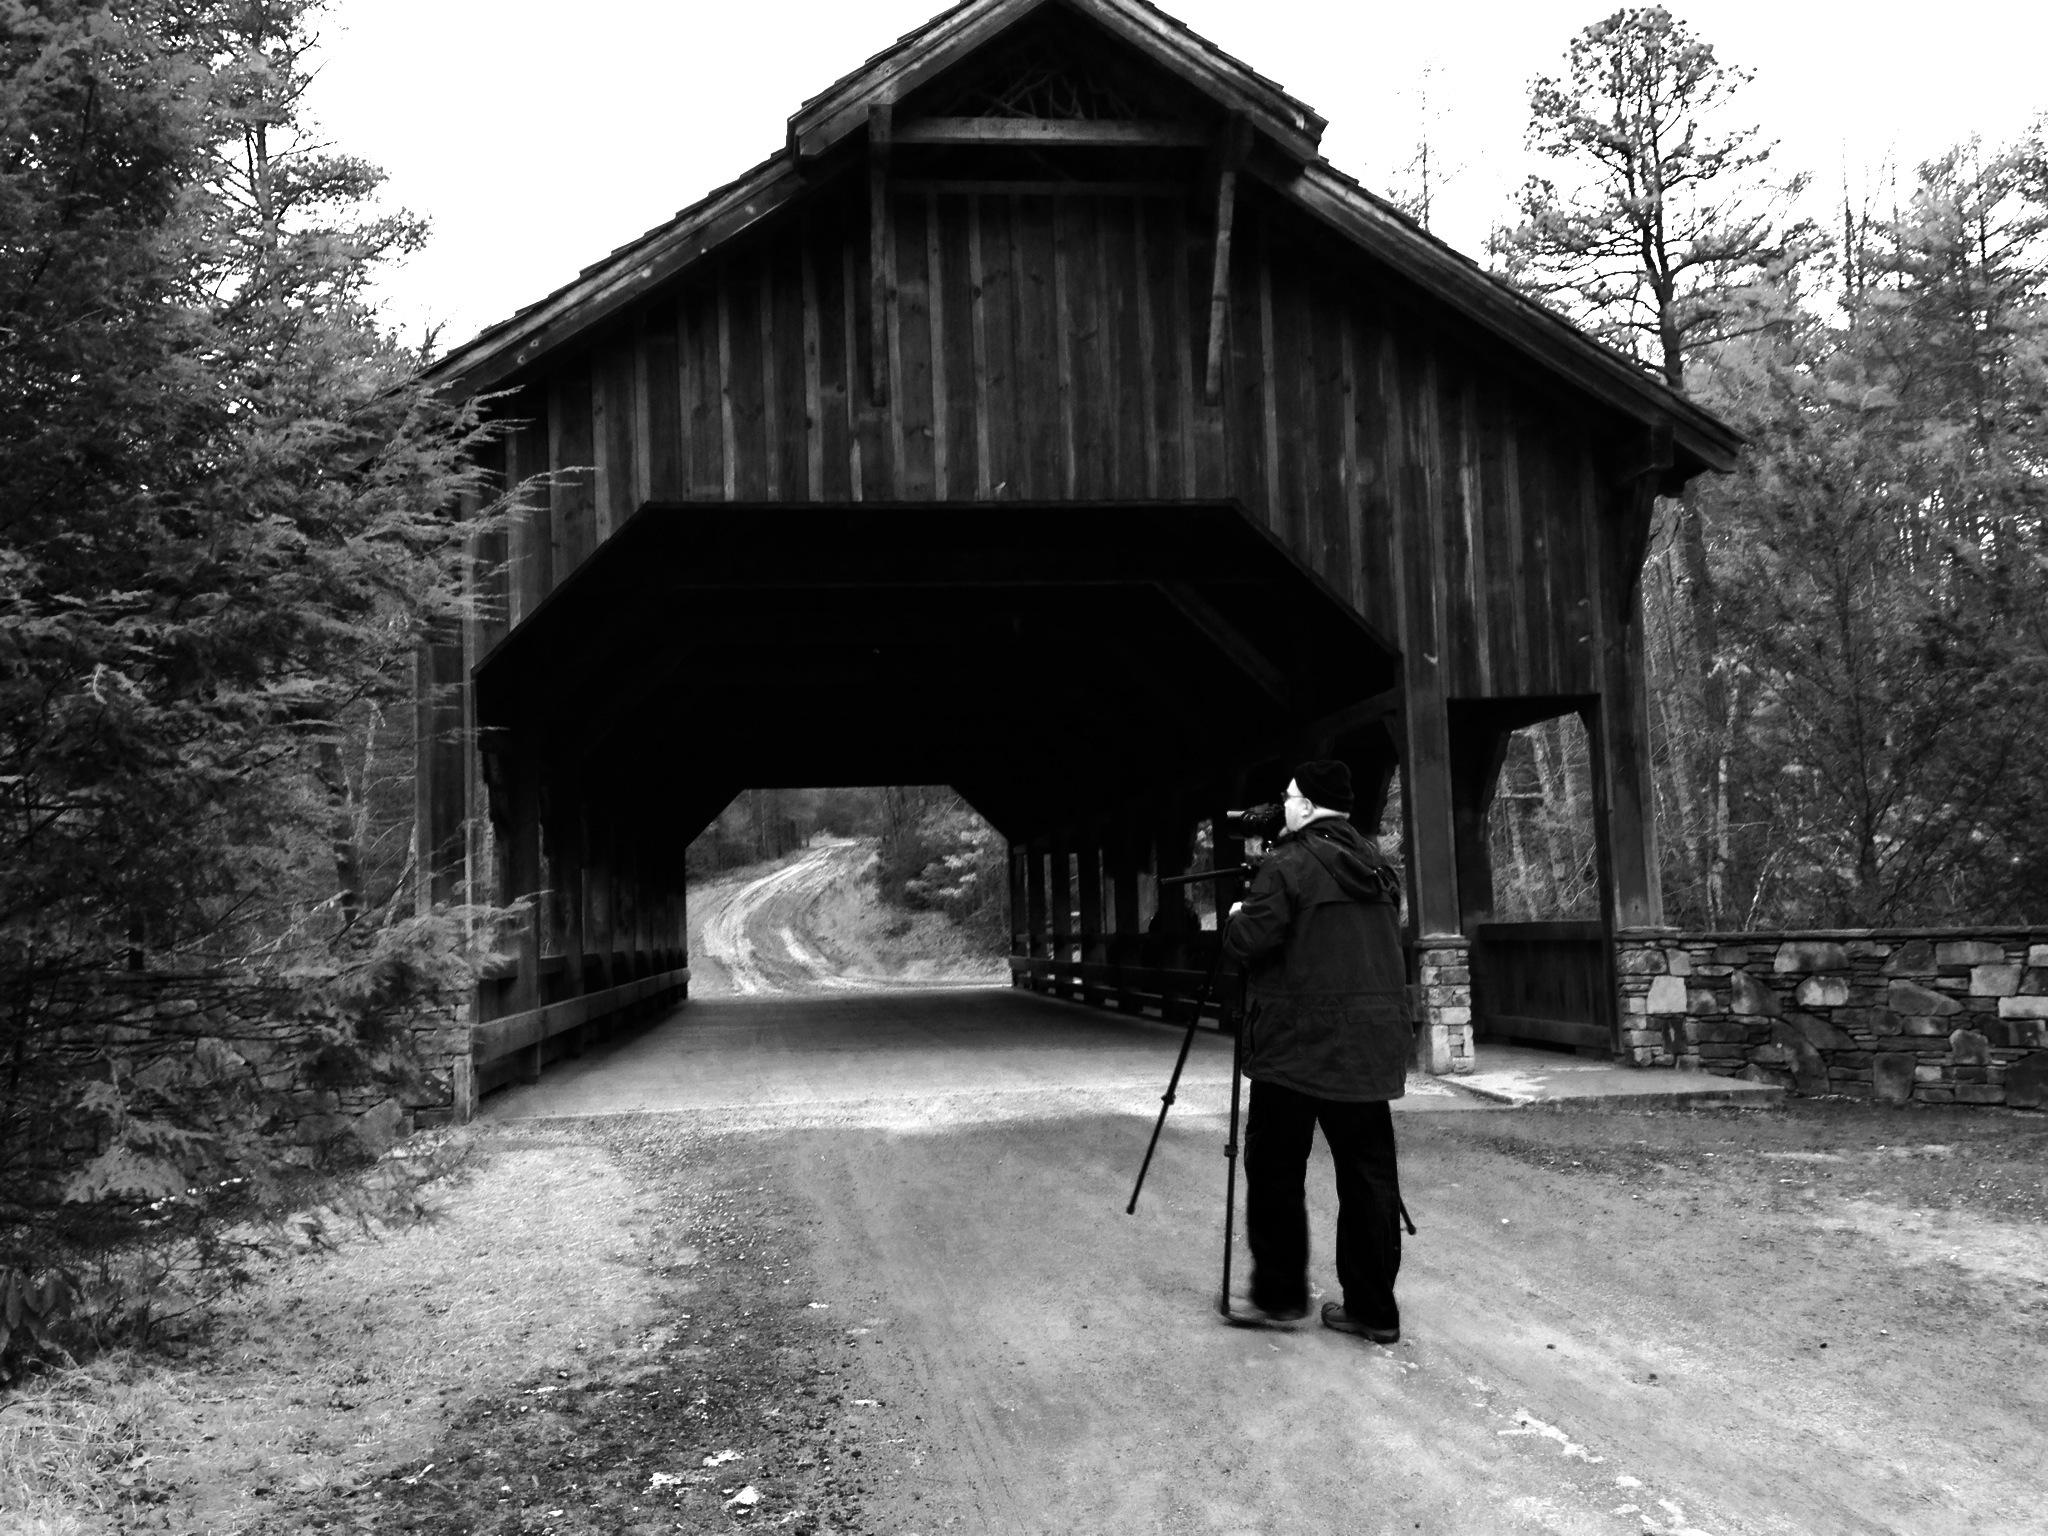 Taking a picture. Photographer: Rebecca Puett